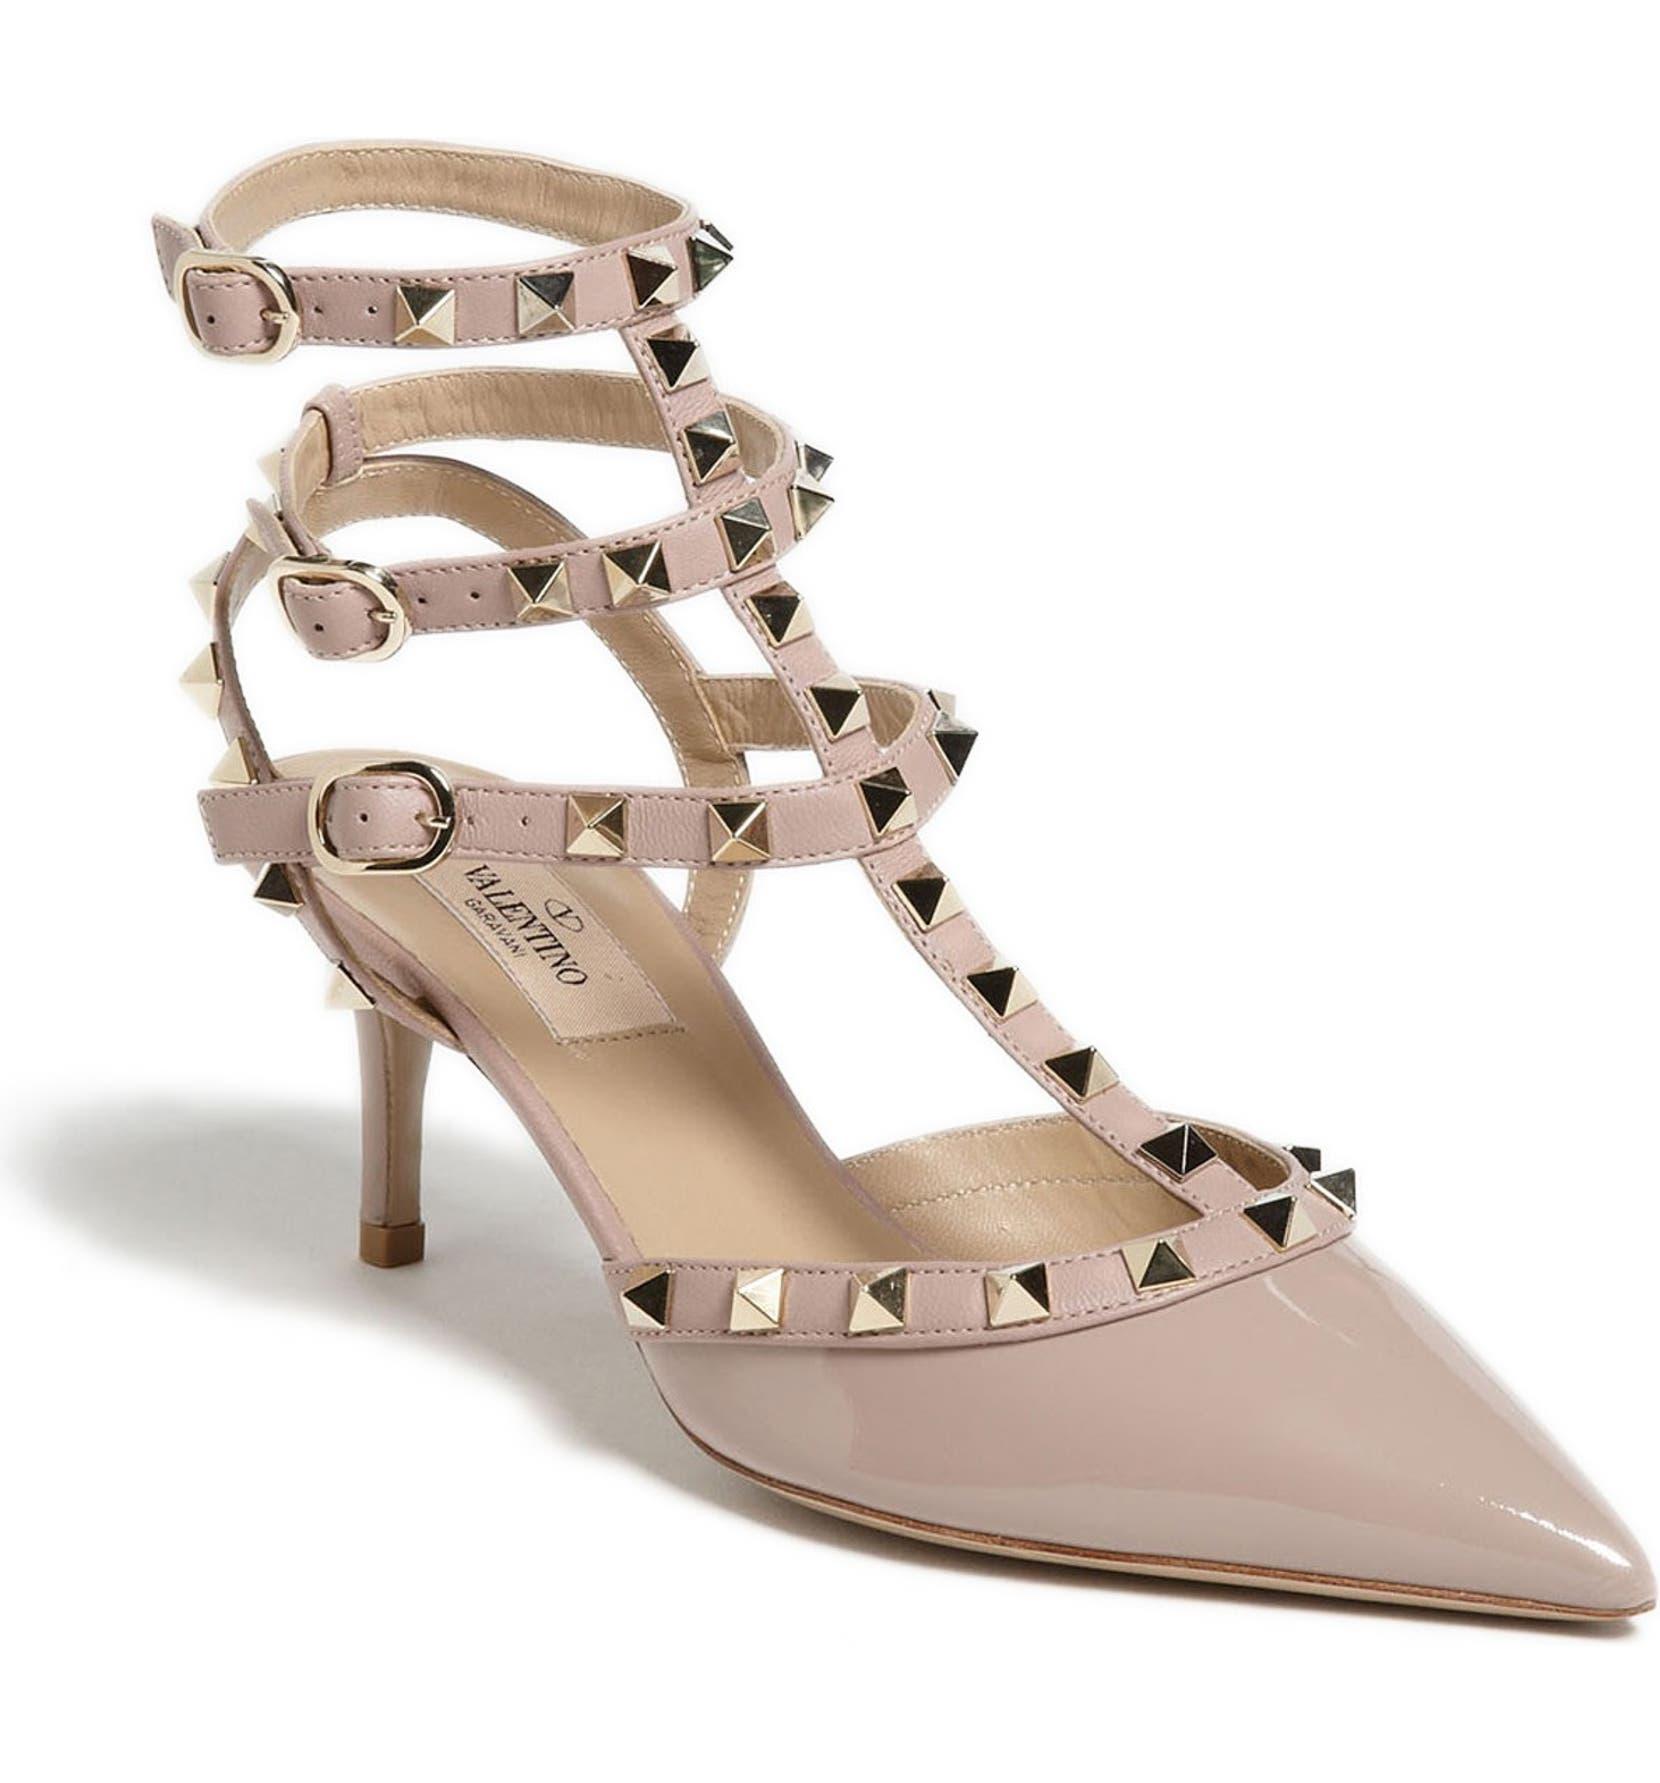 4d2fc034751e0 Valentino Garavani Leather Rockstud Pumps 100 #AD , #sponsored, #Leather, #